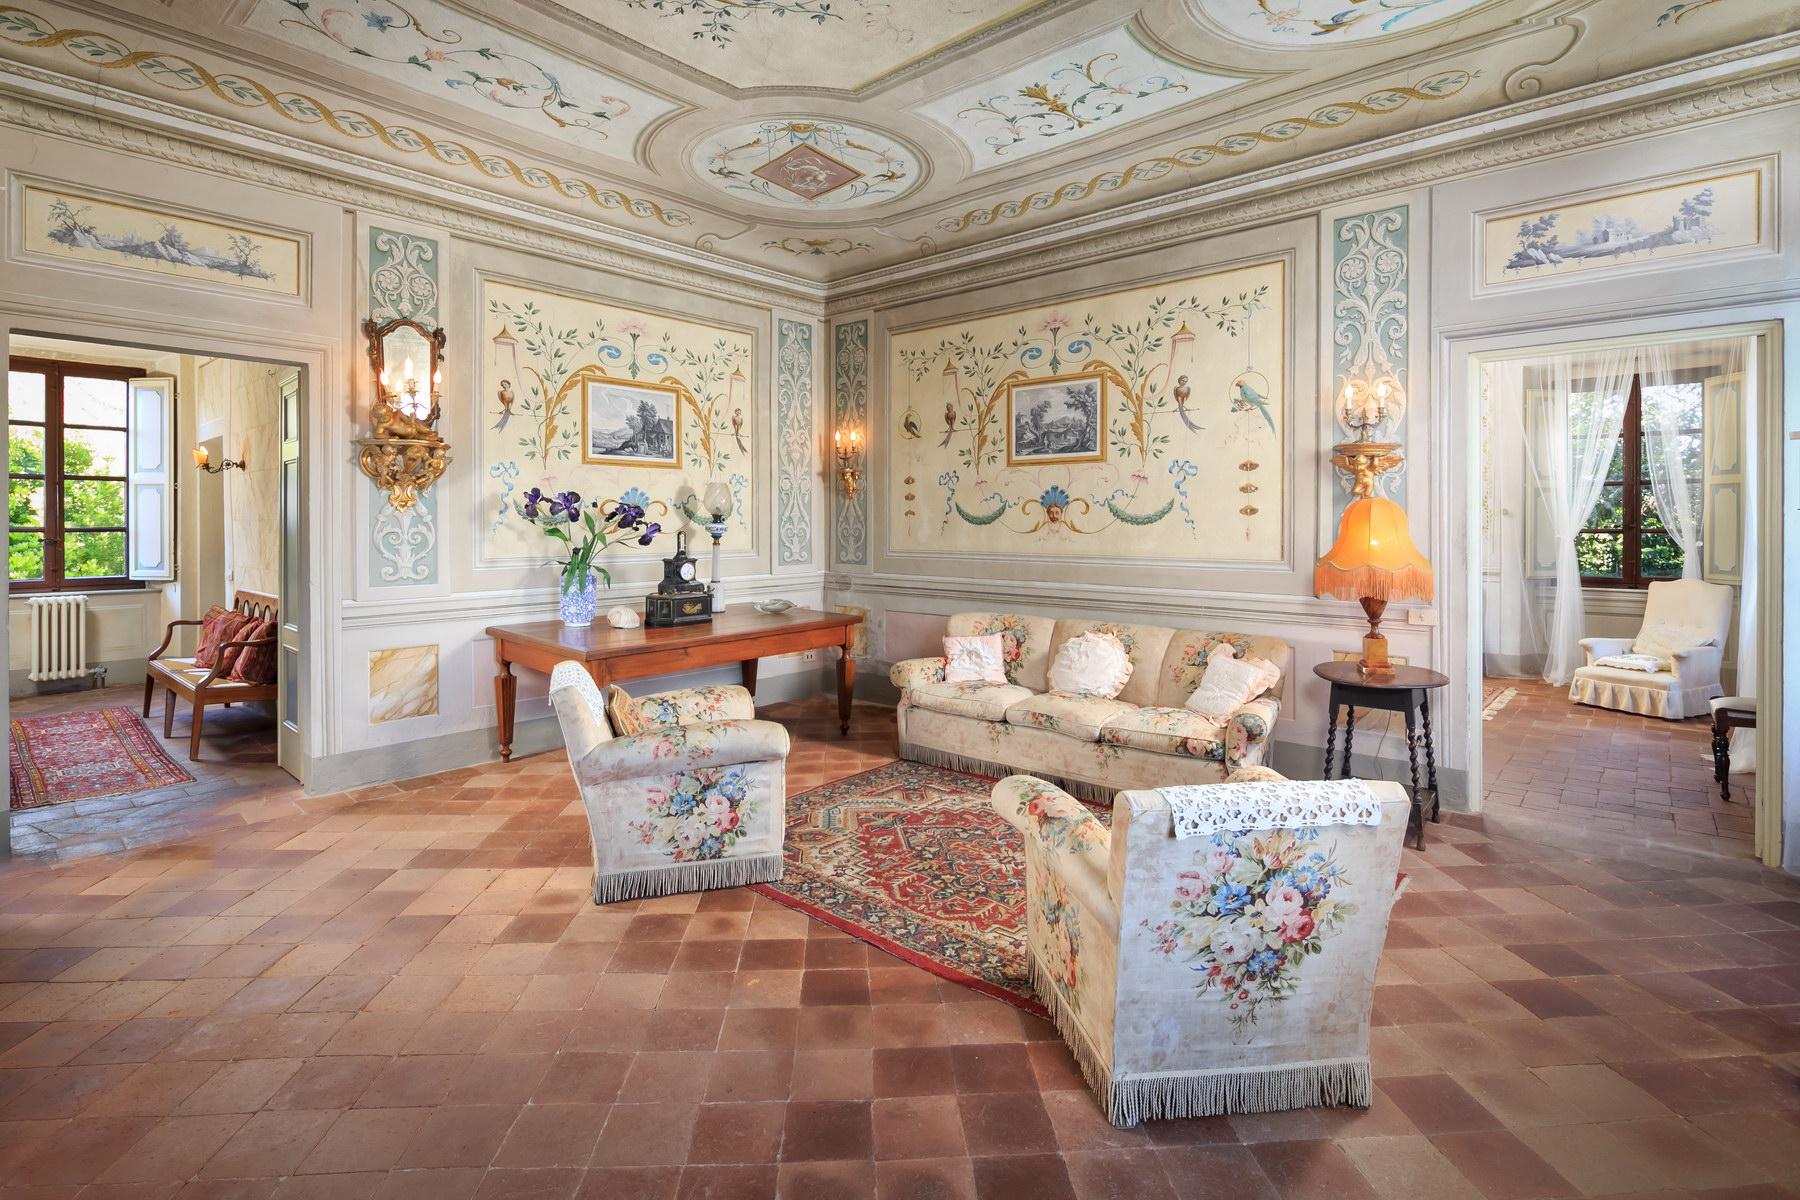 Villa in Vendita a Capannori: 5 locali, 570 mq - Foto 17